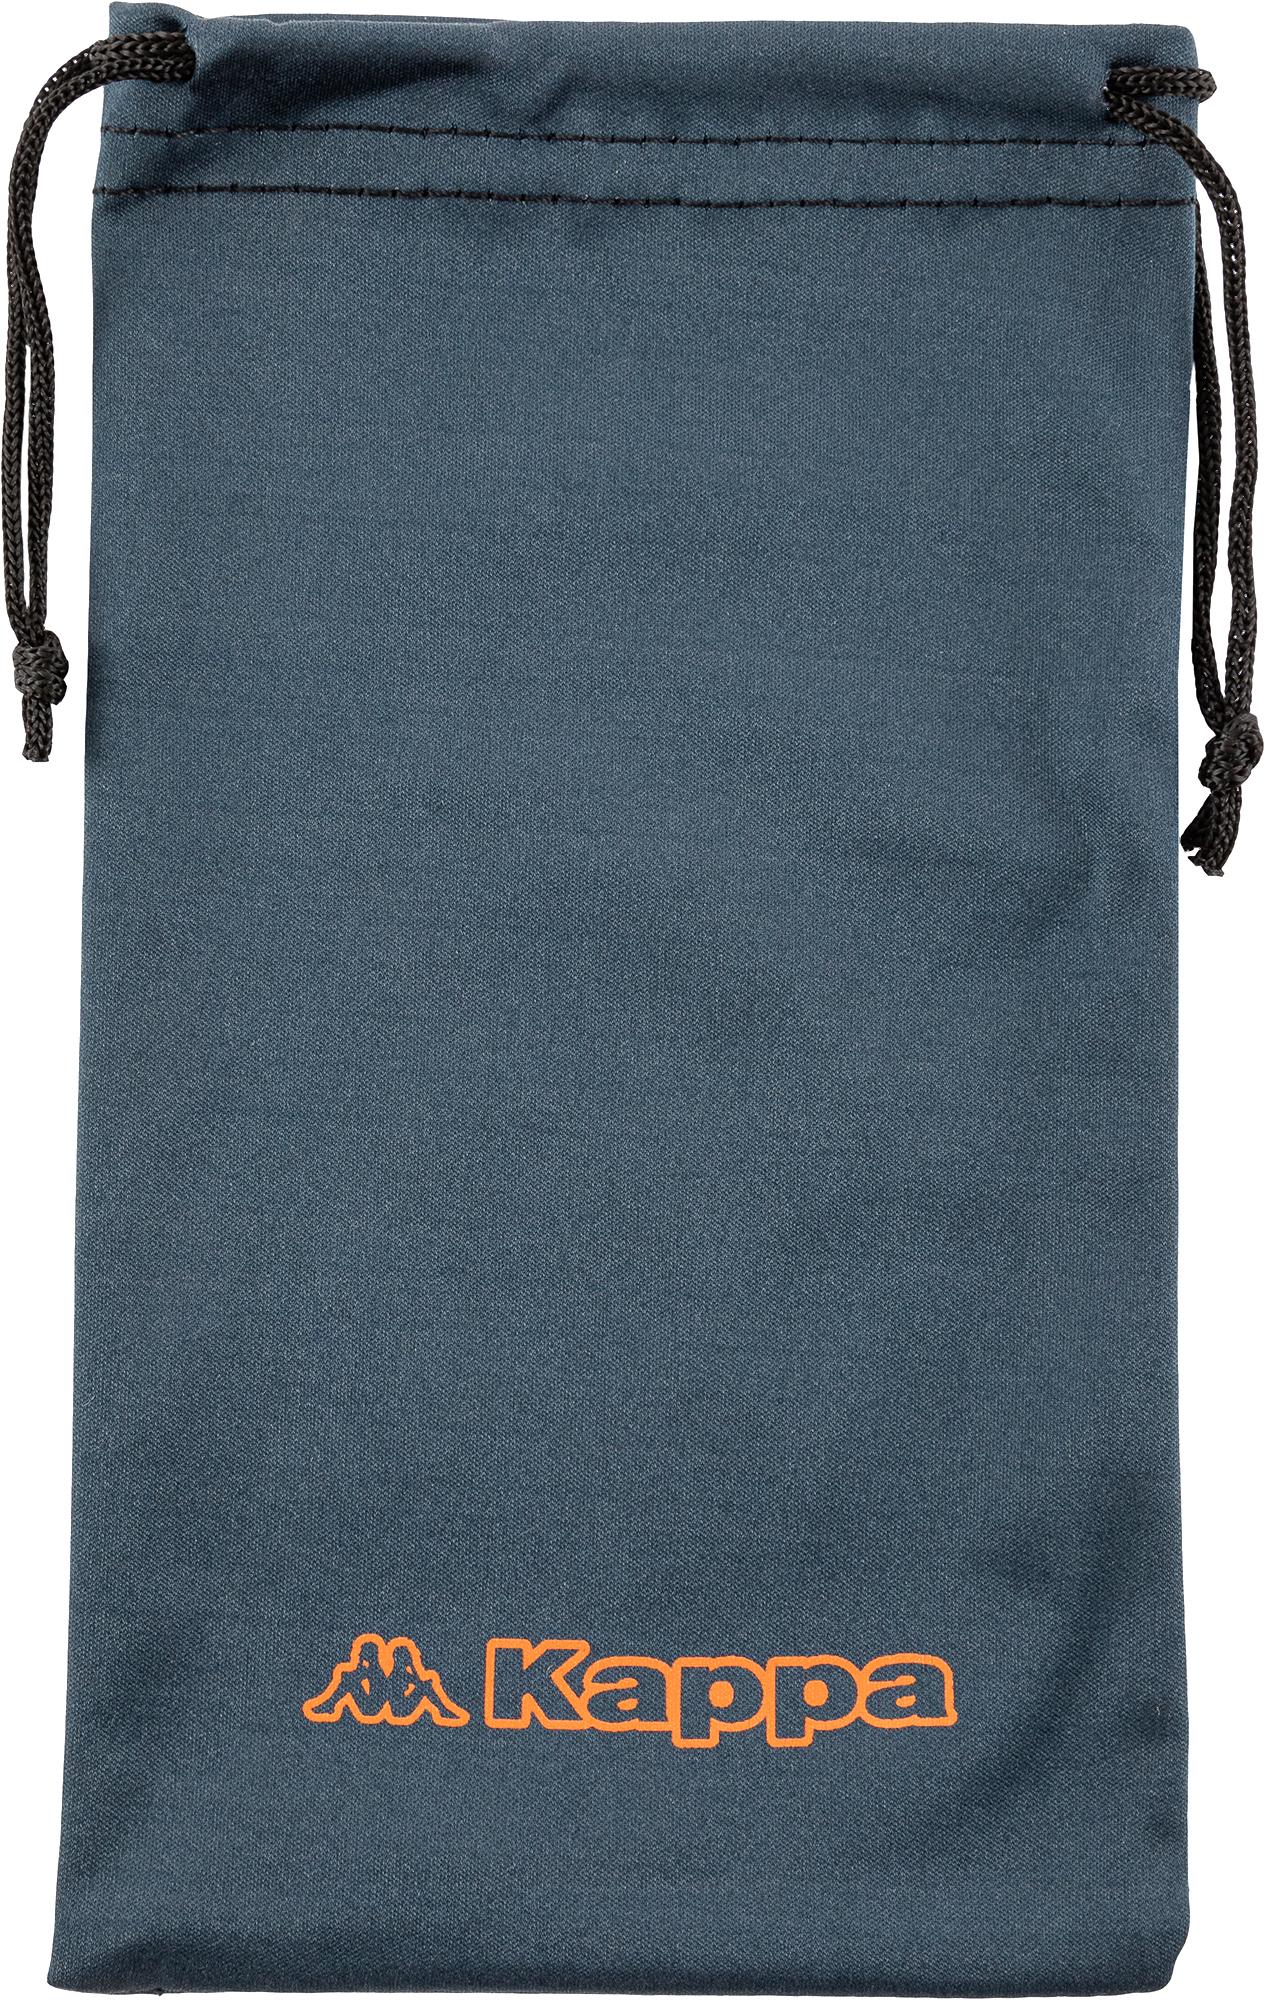 Kappa S18EKAAC017-5M one size Чехол для очков мягкий темно-синий р. one size чехол x линия тпу кожи гель мягкий чехол для optimus l4 ii e440